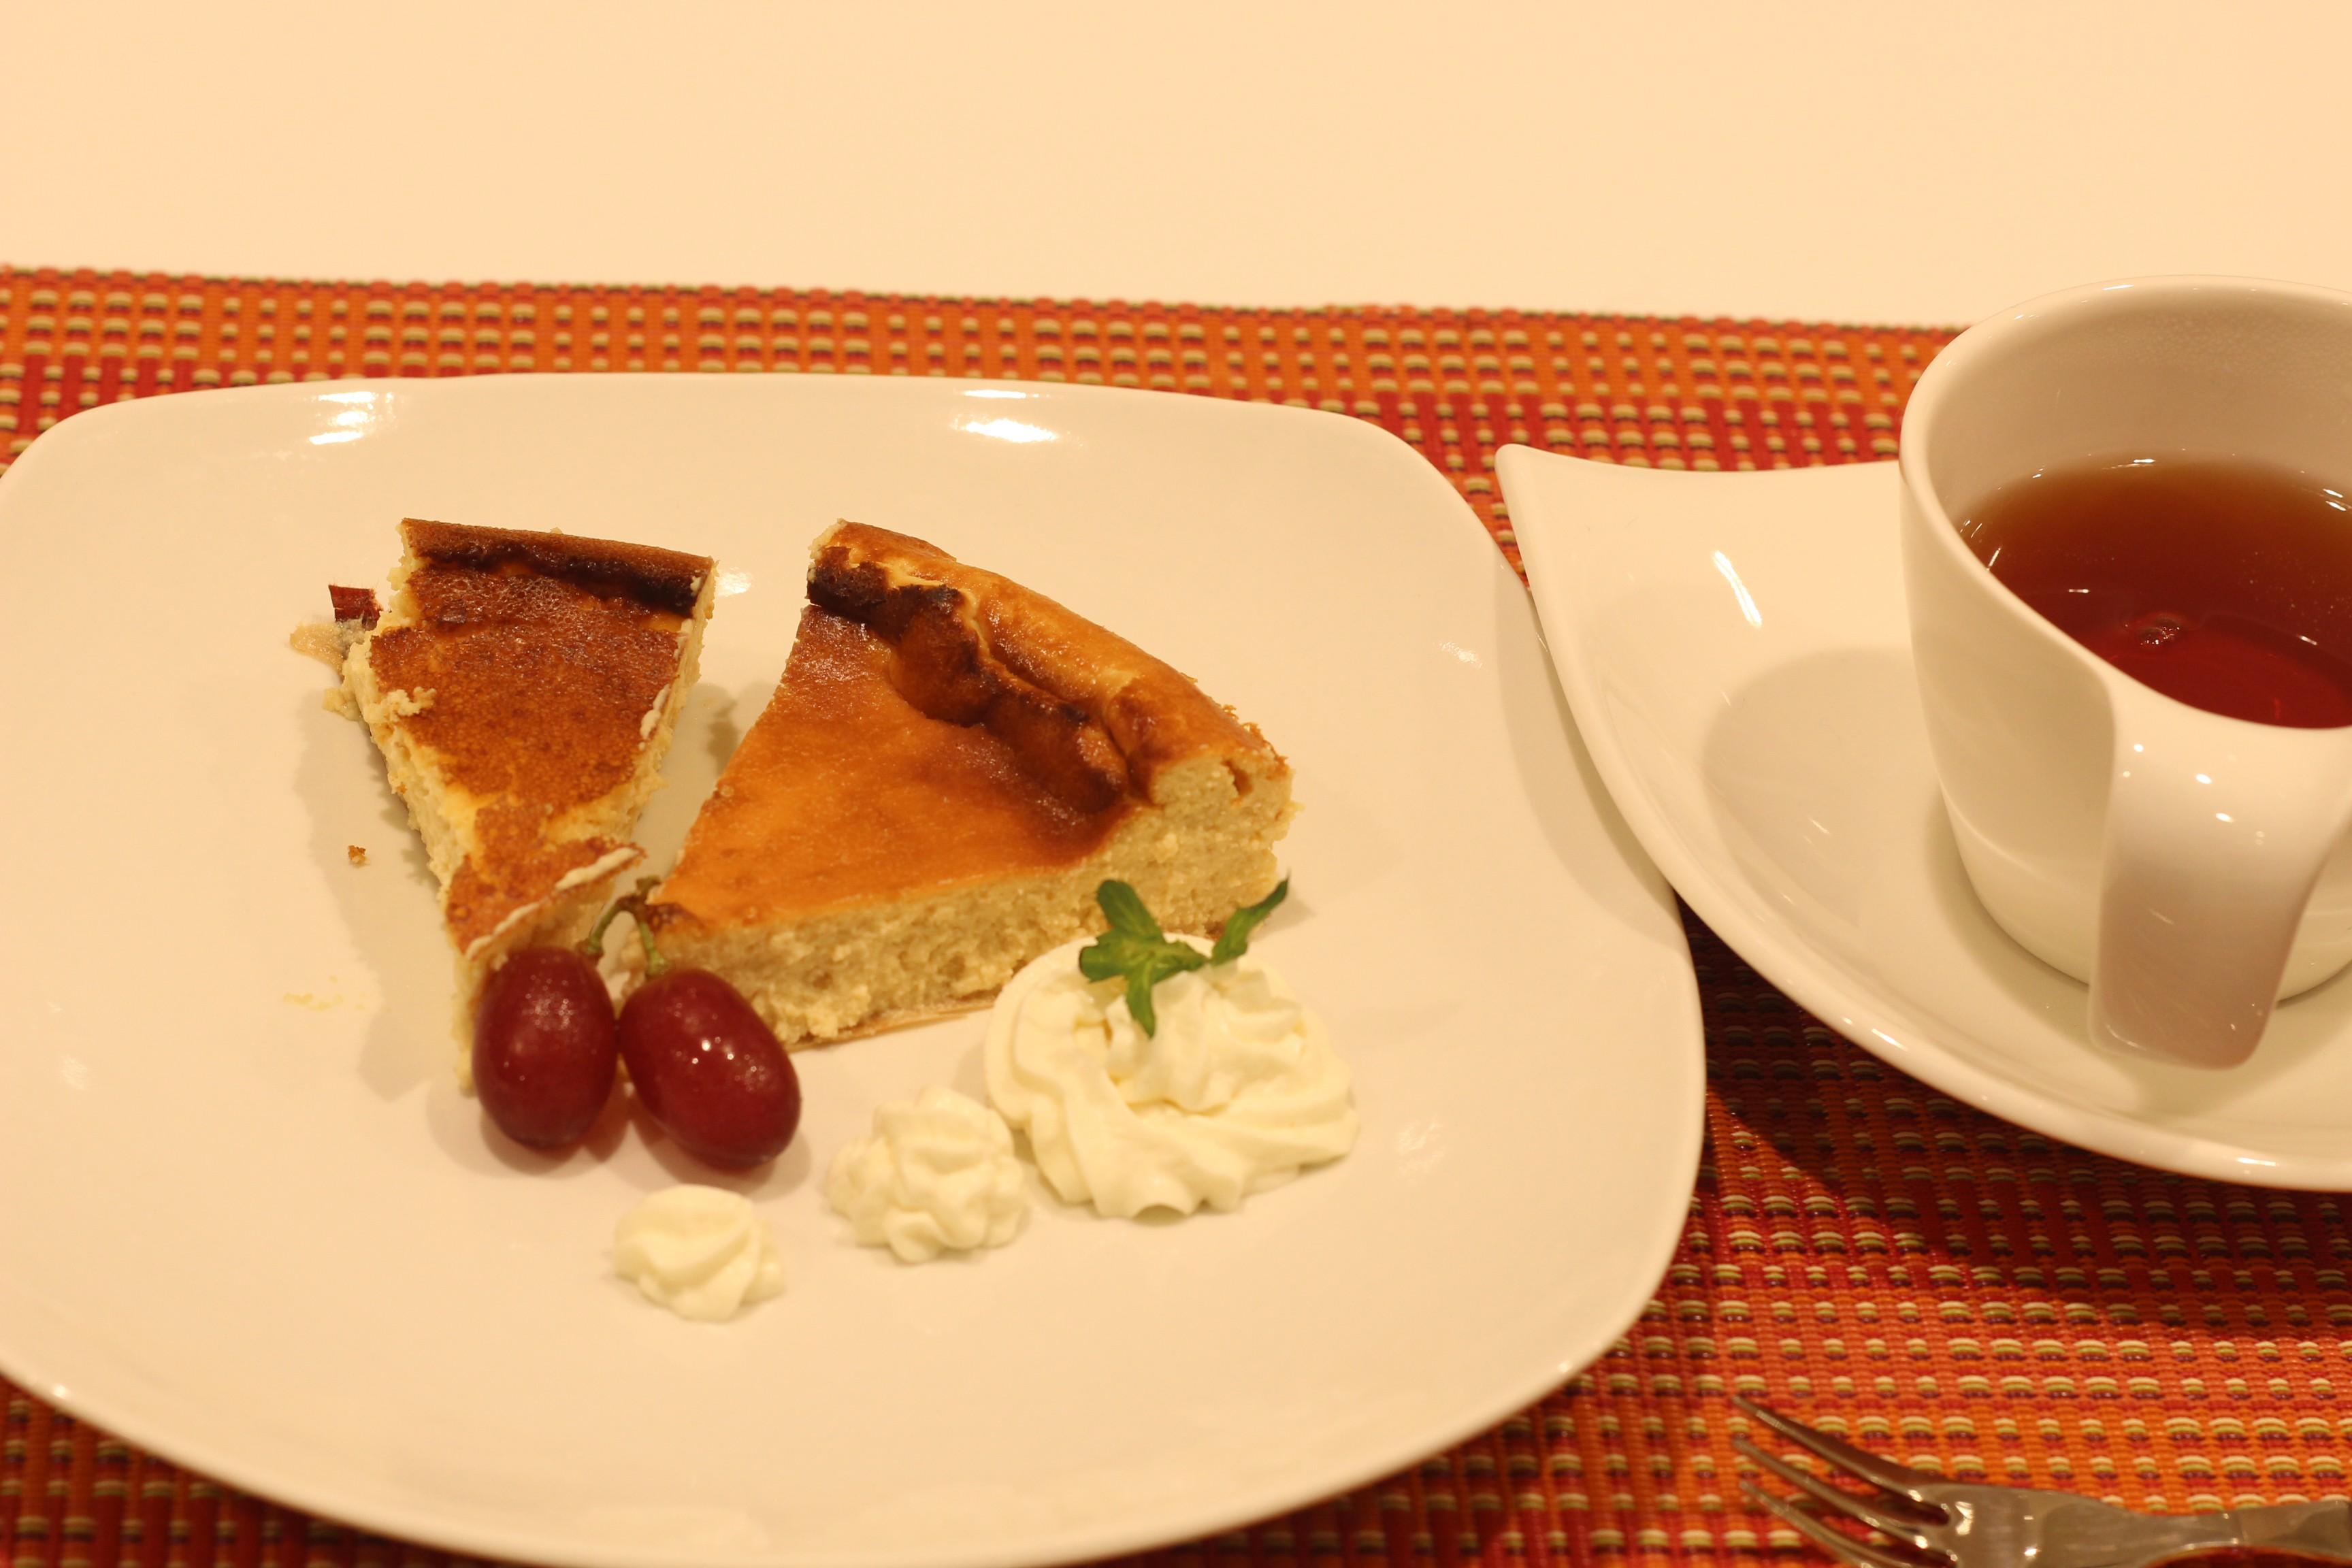 a-ta-sante糖質制限パン料理教室、阿倍野区西田辺。あべのハルカスレッスン。